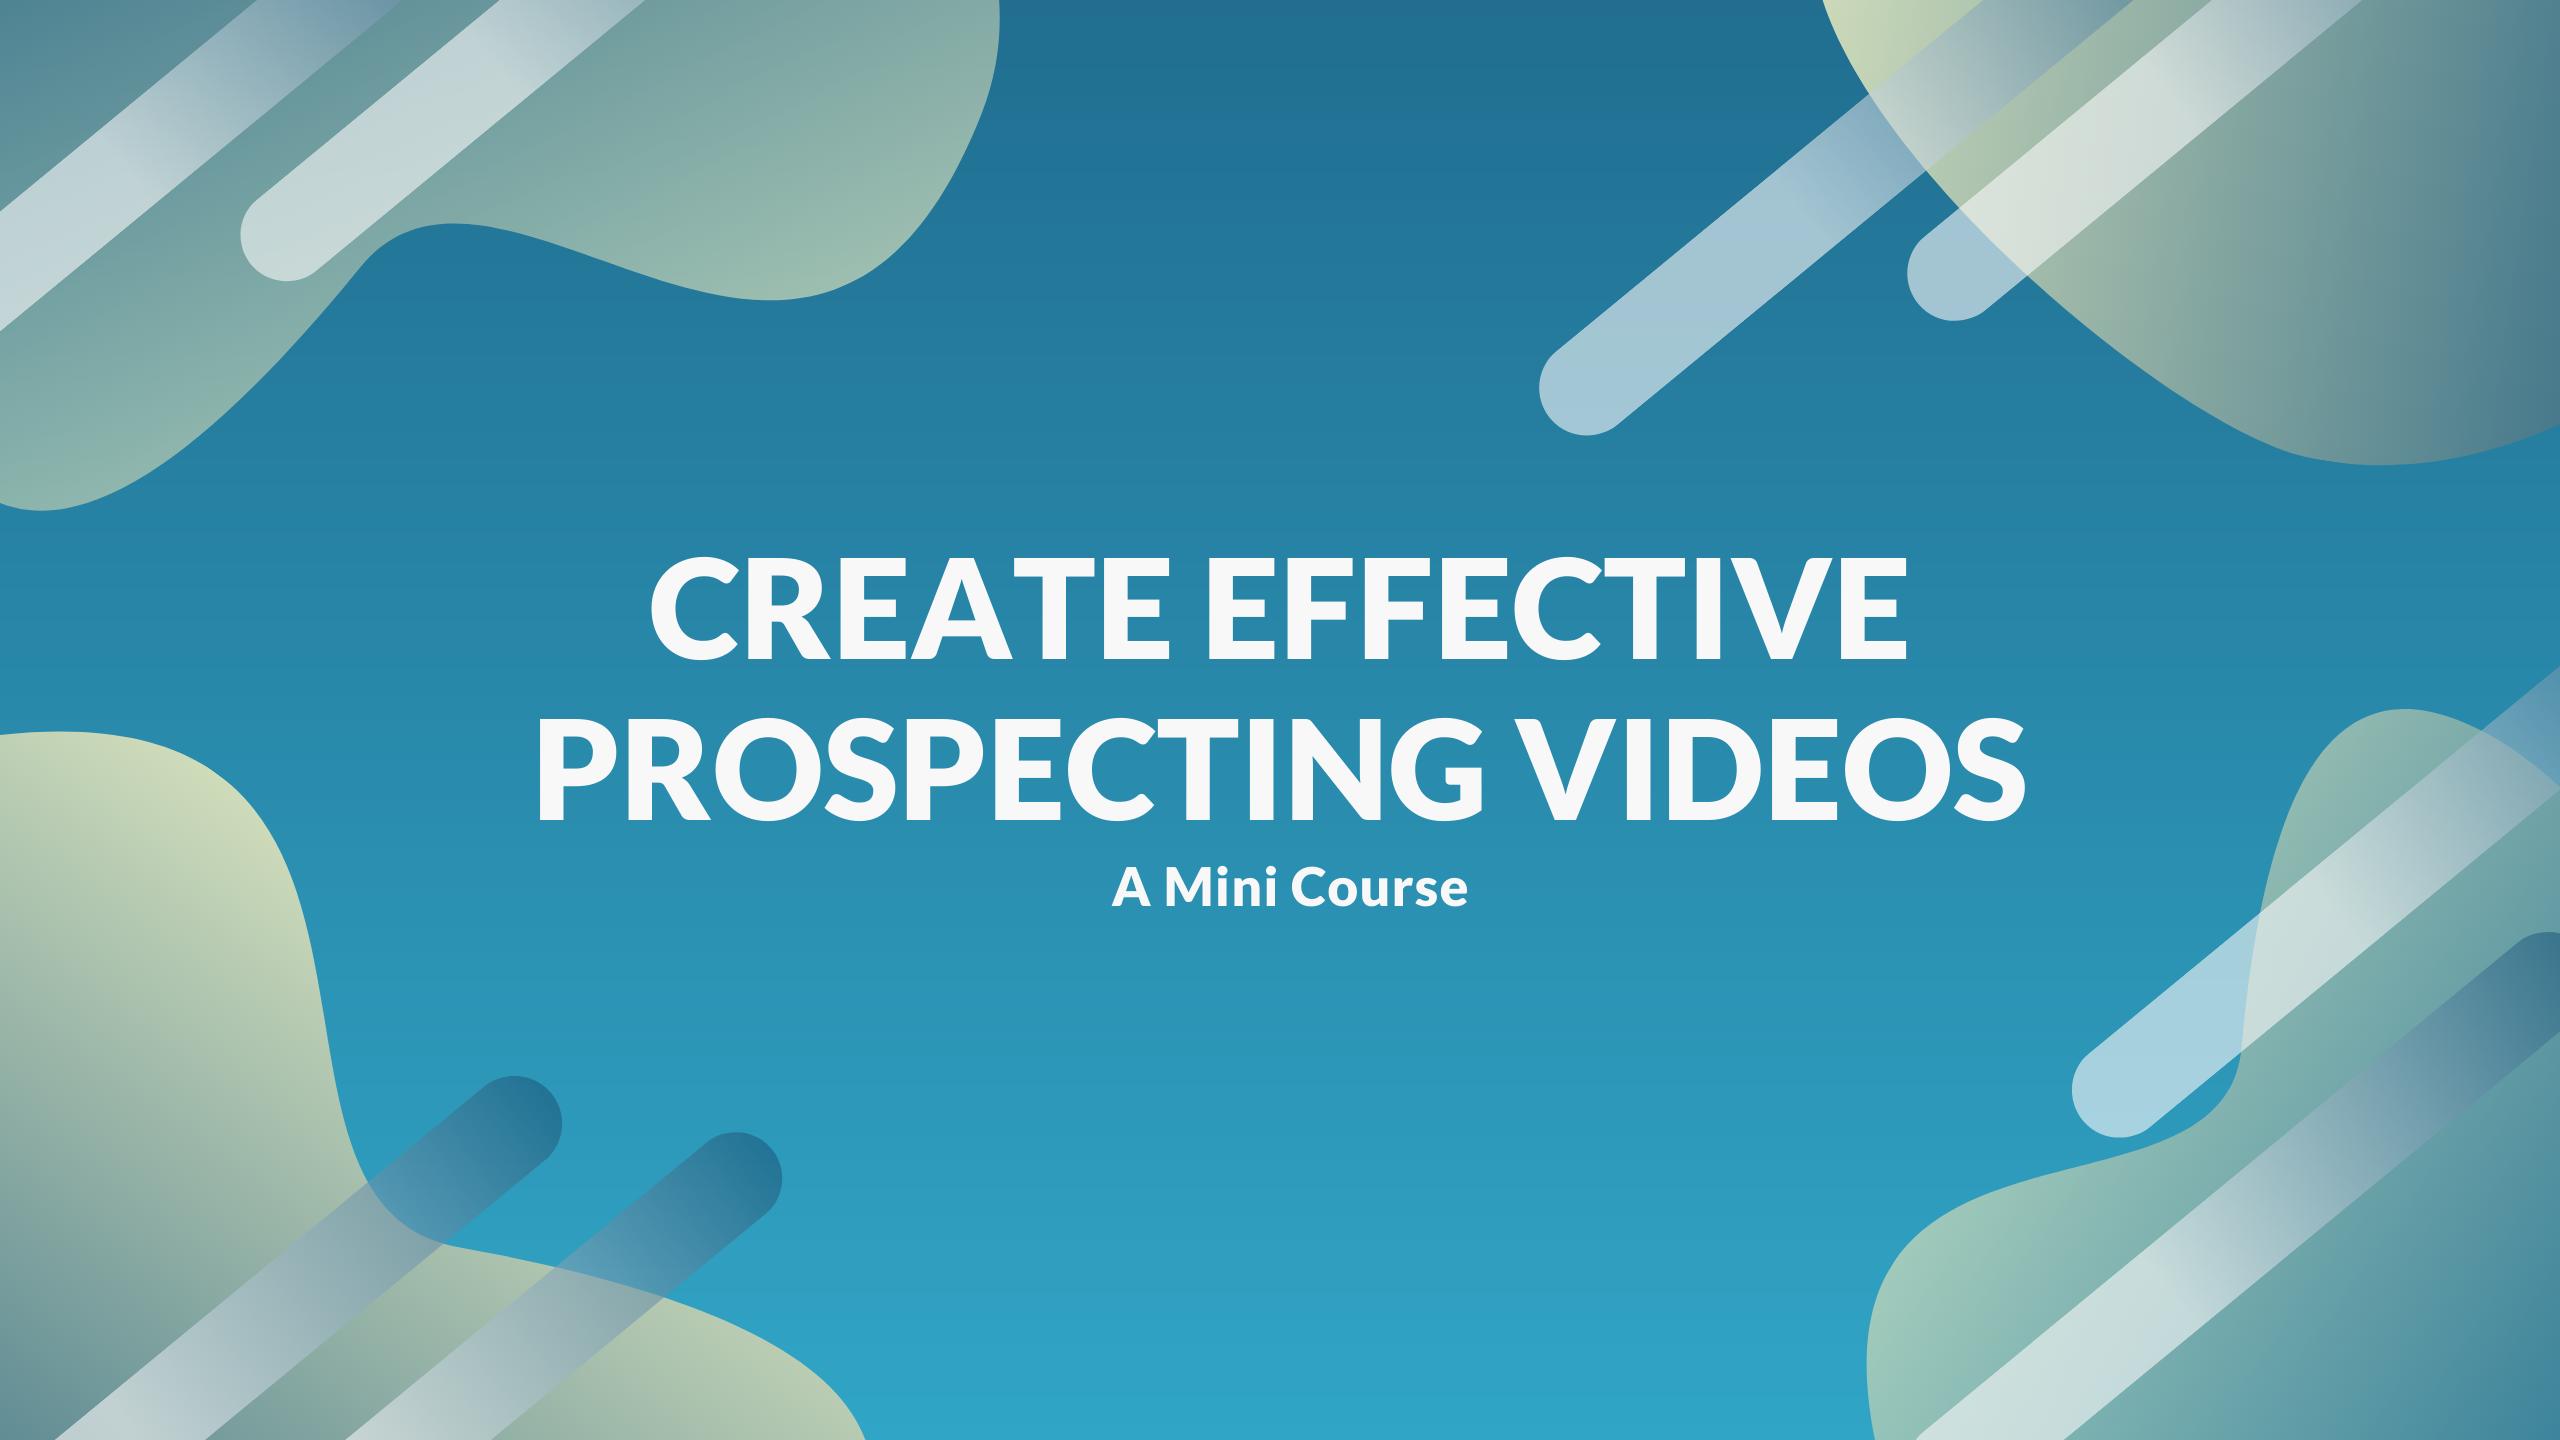 create effective prospecting videos